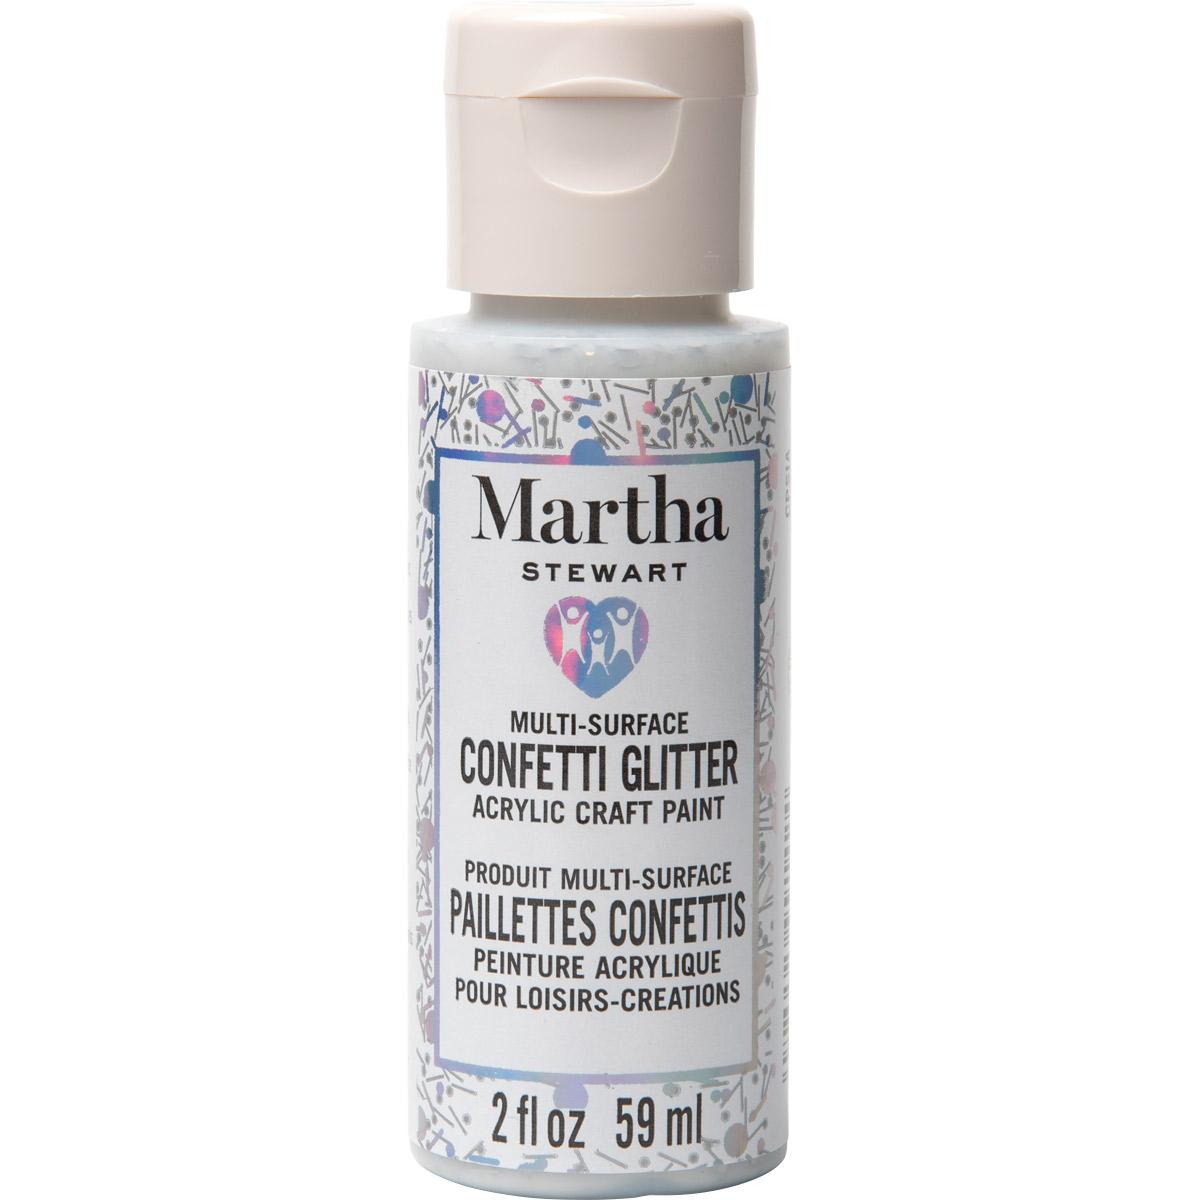 Martha Stewart® 2oz Multi-Surface Confetti Glitter Acrylic Craft Paint - Disco Ball